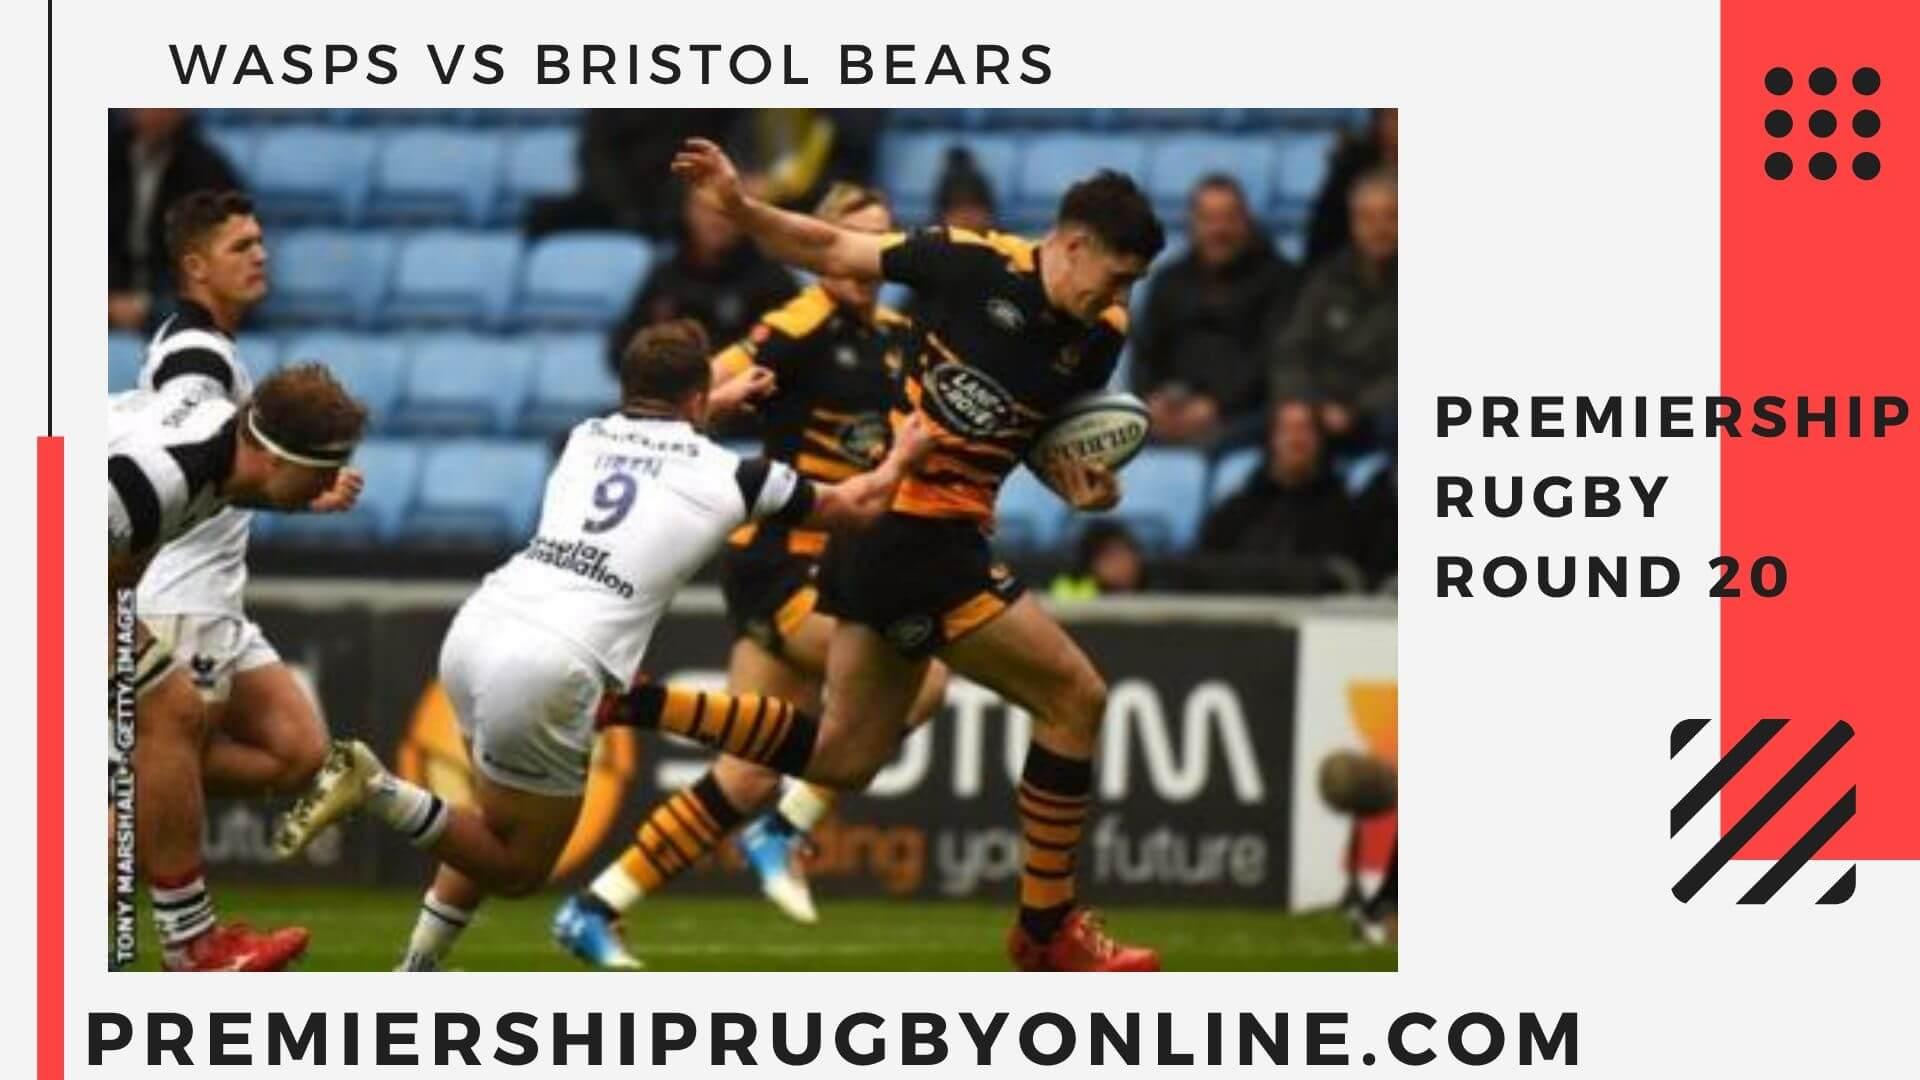 Wasps vs Bristol Bears Live stream   Round 20